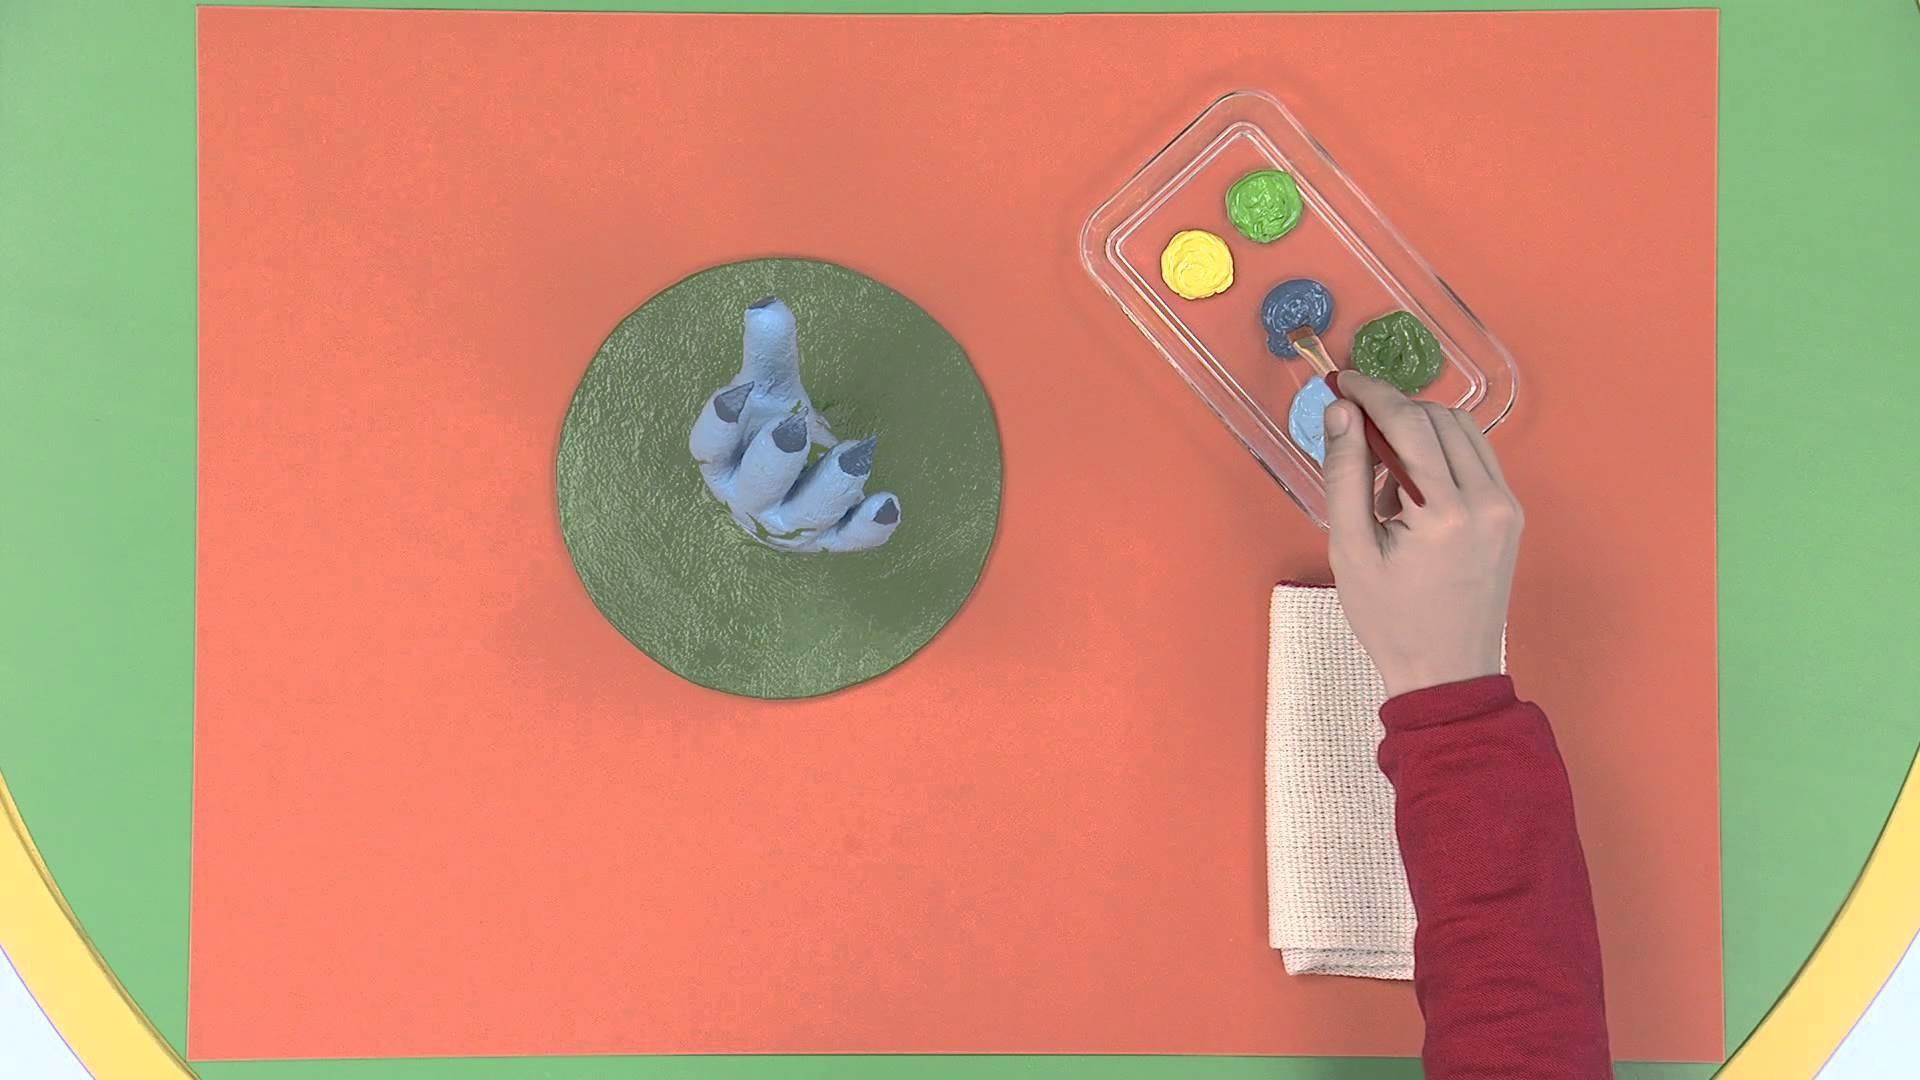 Art attack - Mains de la pétoche - Sur Disney Junior - VF